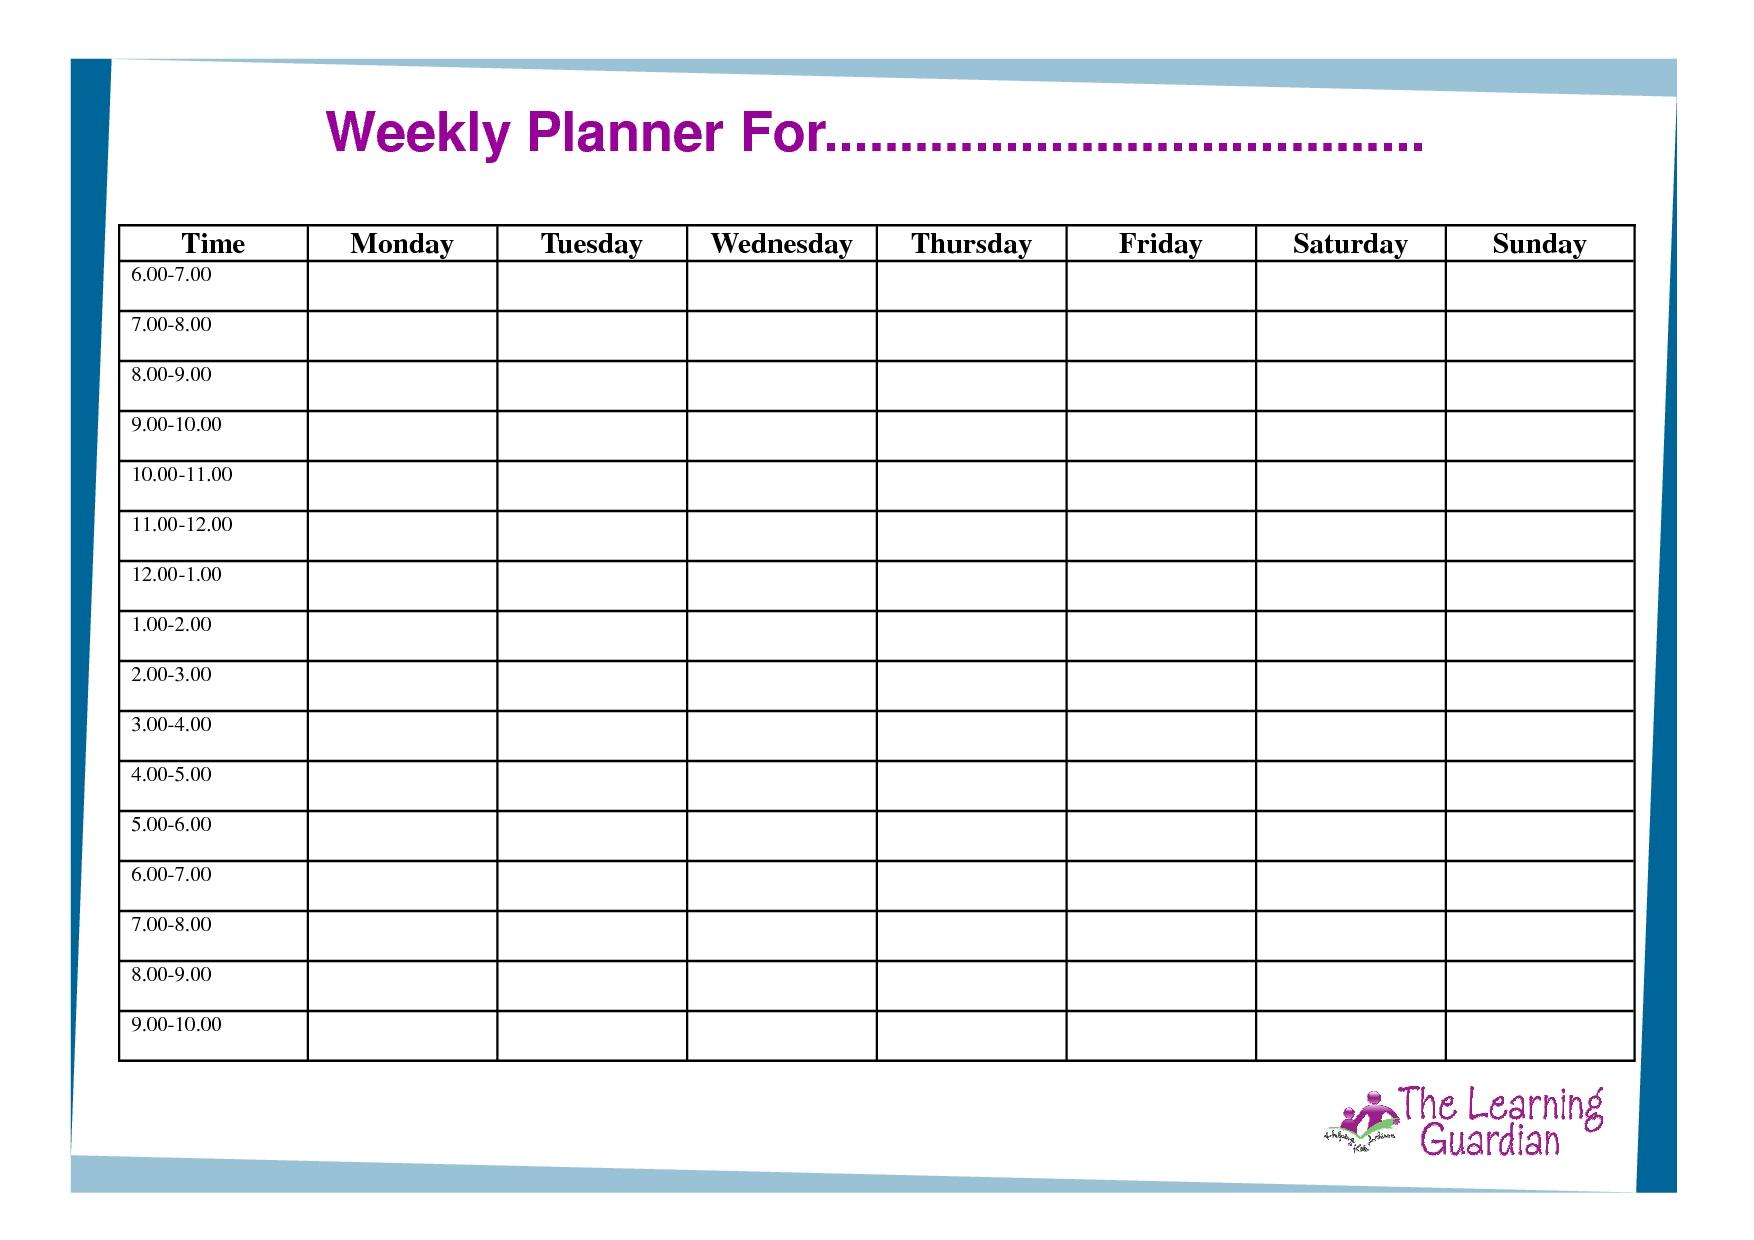 Free Printable Weekly Calendar Templates | Weekly Planner Weekly Calendar Template Monday To Friday